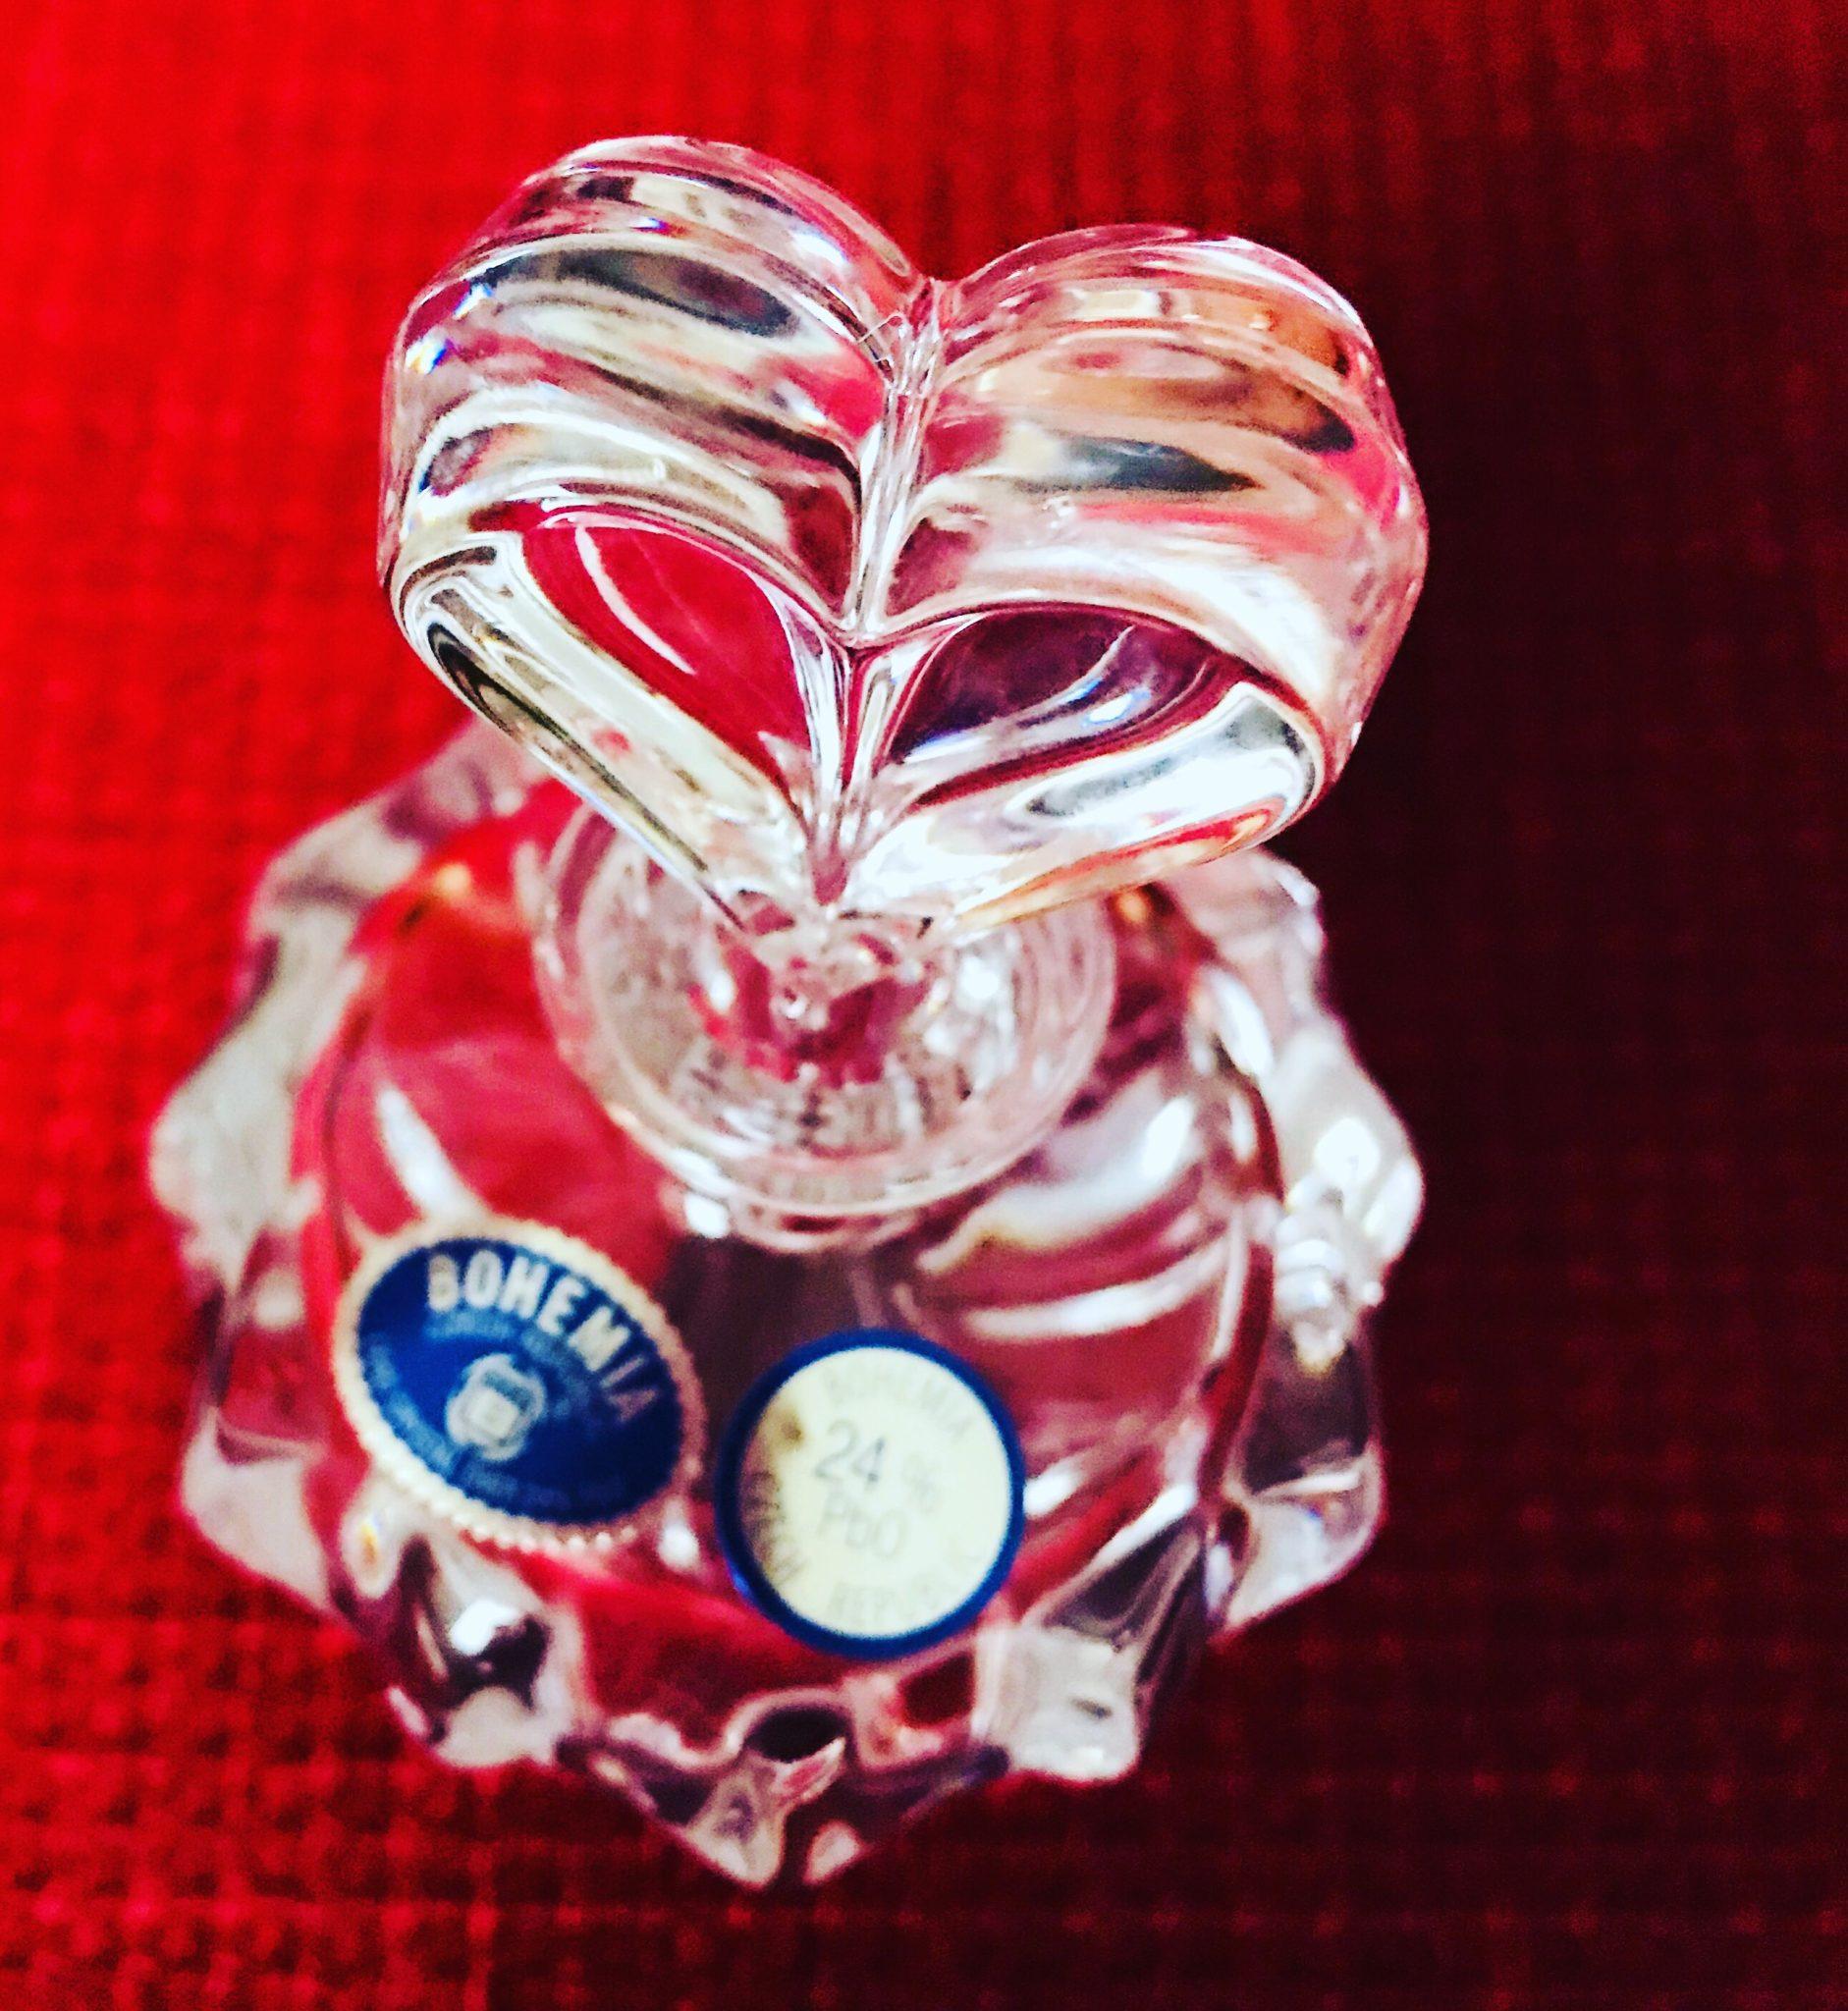 Bohemia Perfume Bottle